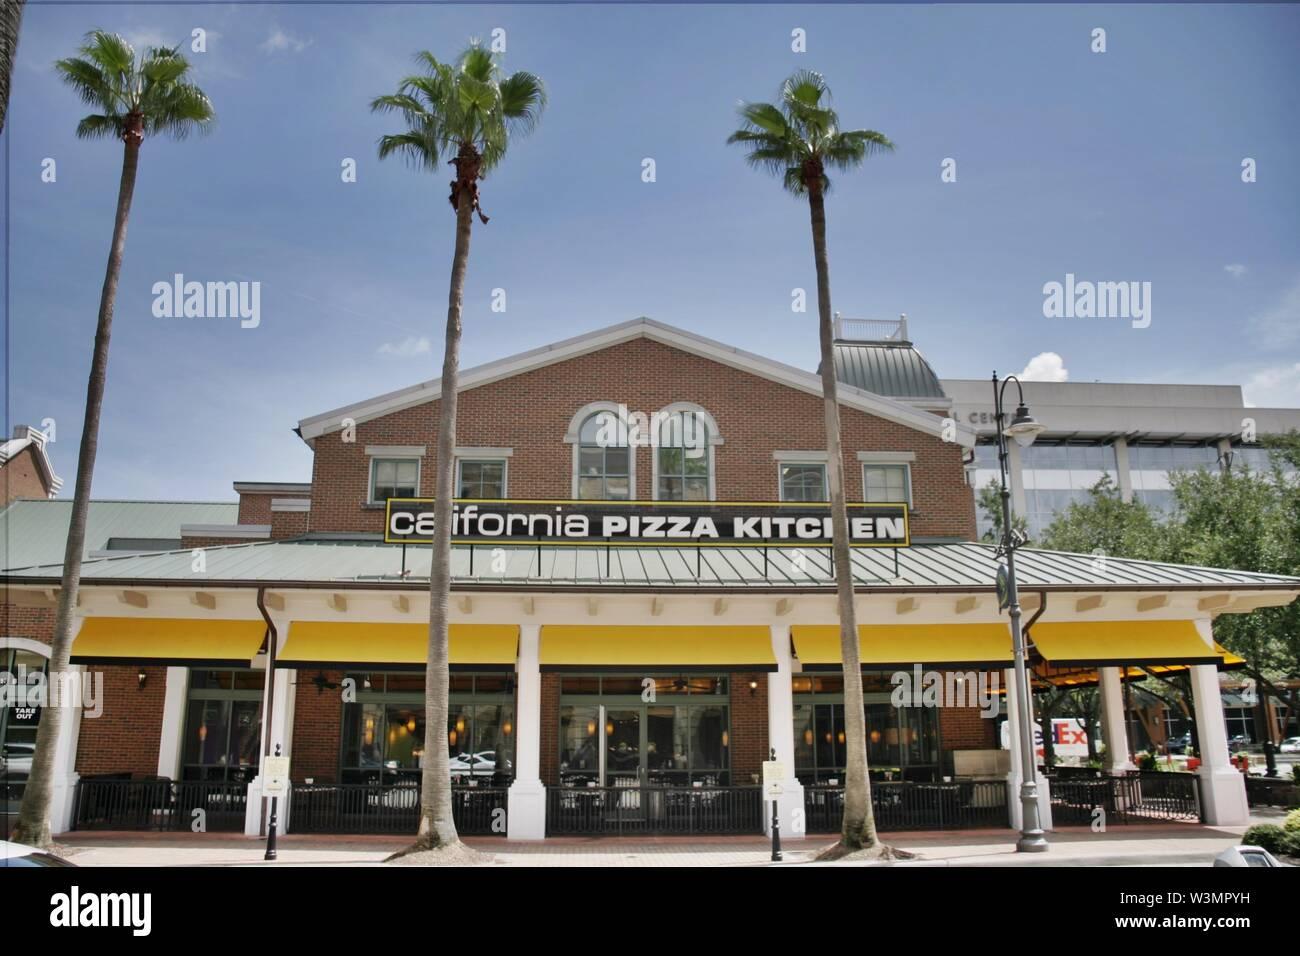 Outstanding California Pizza Kitchen Restaurant Stock Photos Download Free Architecture Designs Rallybritishbridgeorg